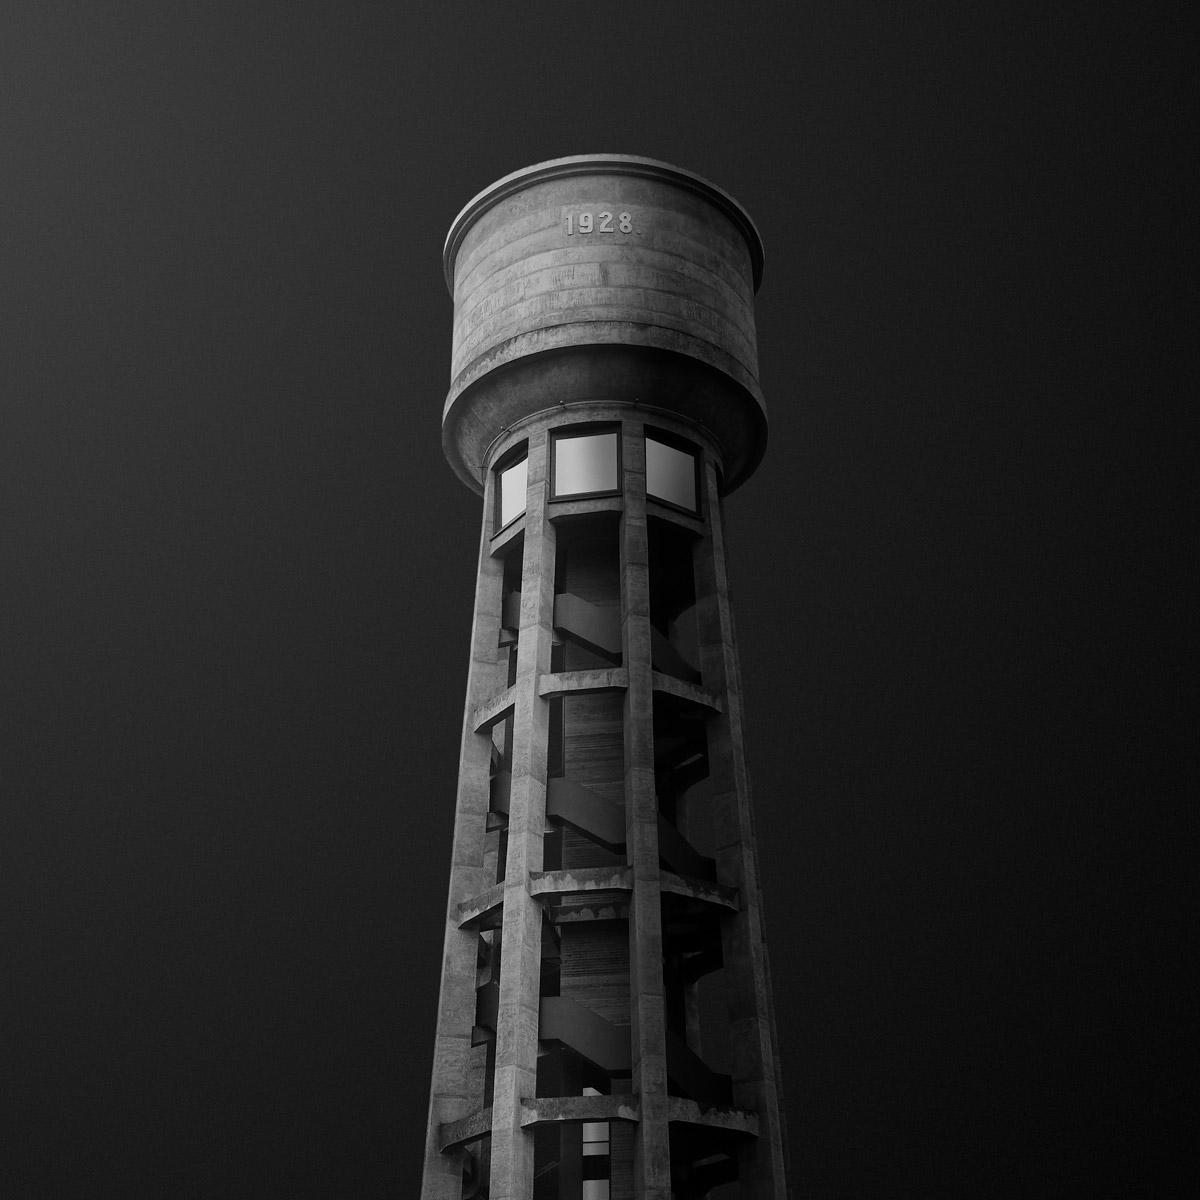 Водные башни Люксембурга, © Гедиминас Карбаускис / Gediminas Karbauskis, Люксембург, Второе место, Фотоконкурс «Чёрно-белая фотография» — Black & White Photography Awards — Журнал Dodho